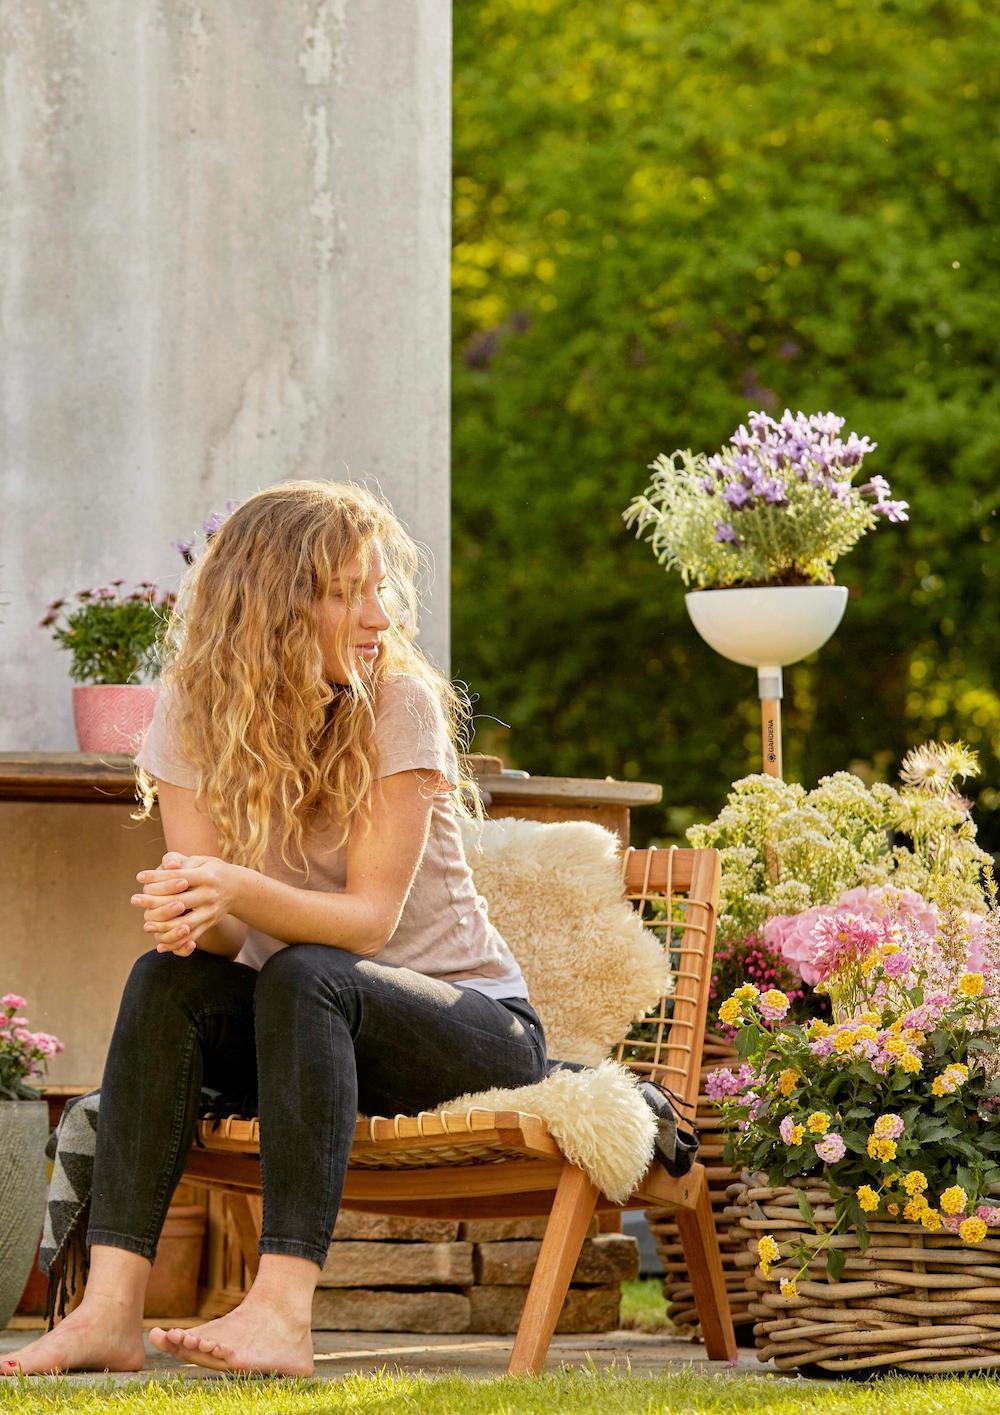 Plantenbak met clickup systeem van Gardena #plantenbak #tuin #clickup #tuinidee #tuininspiratie